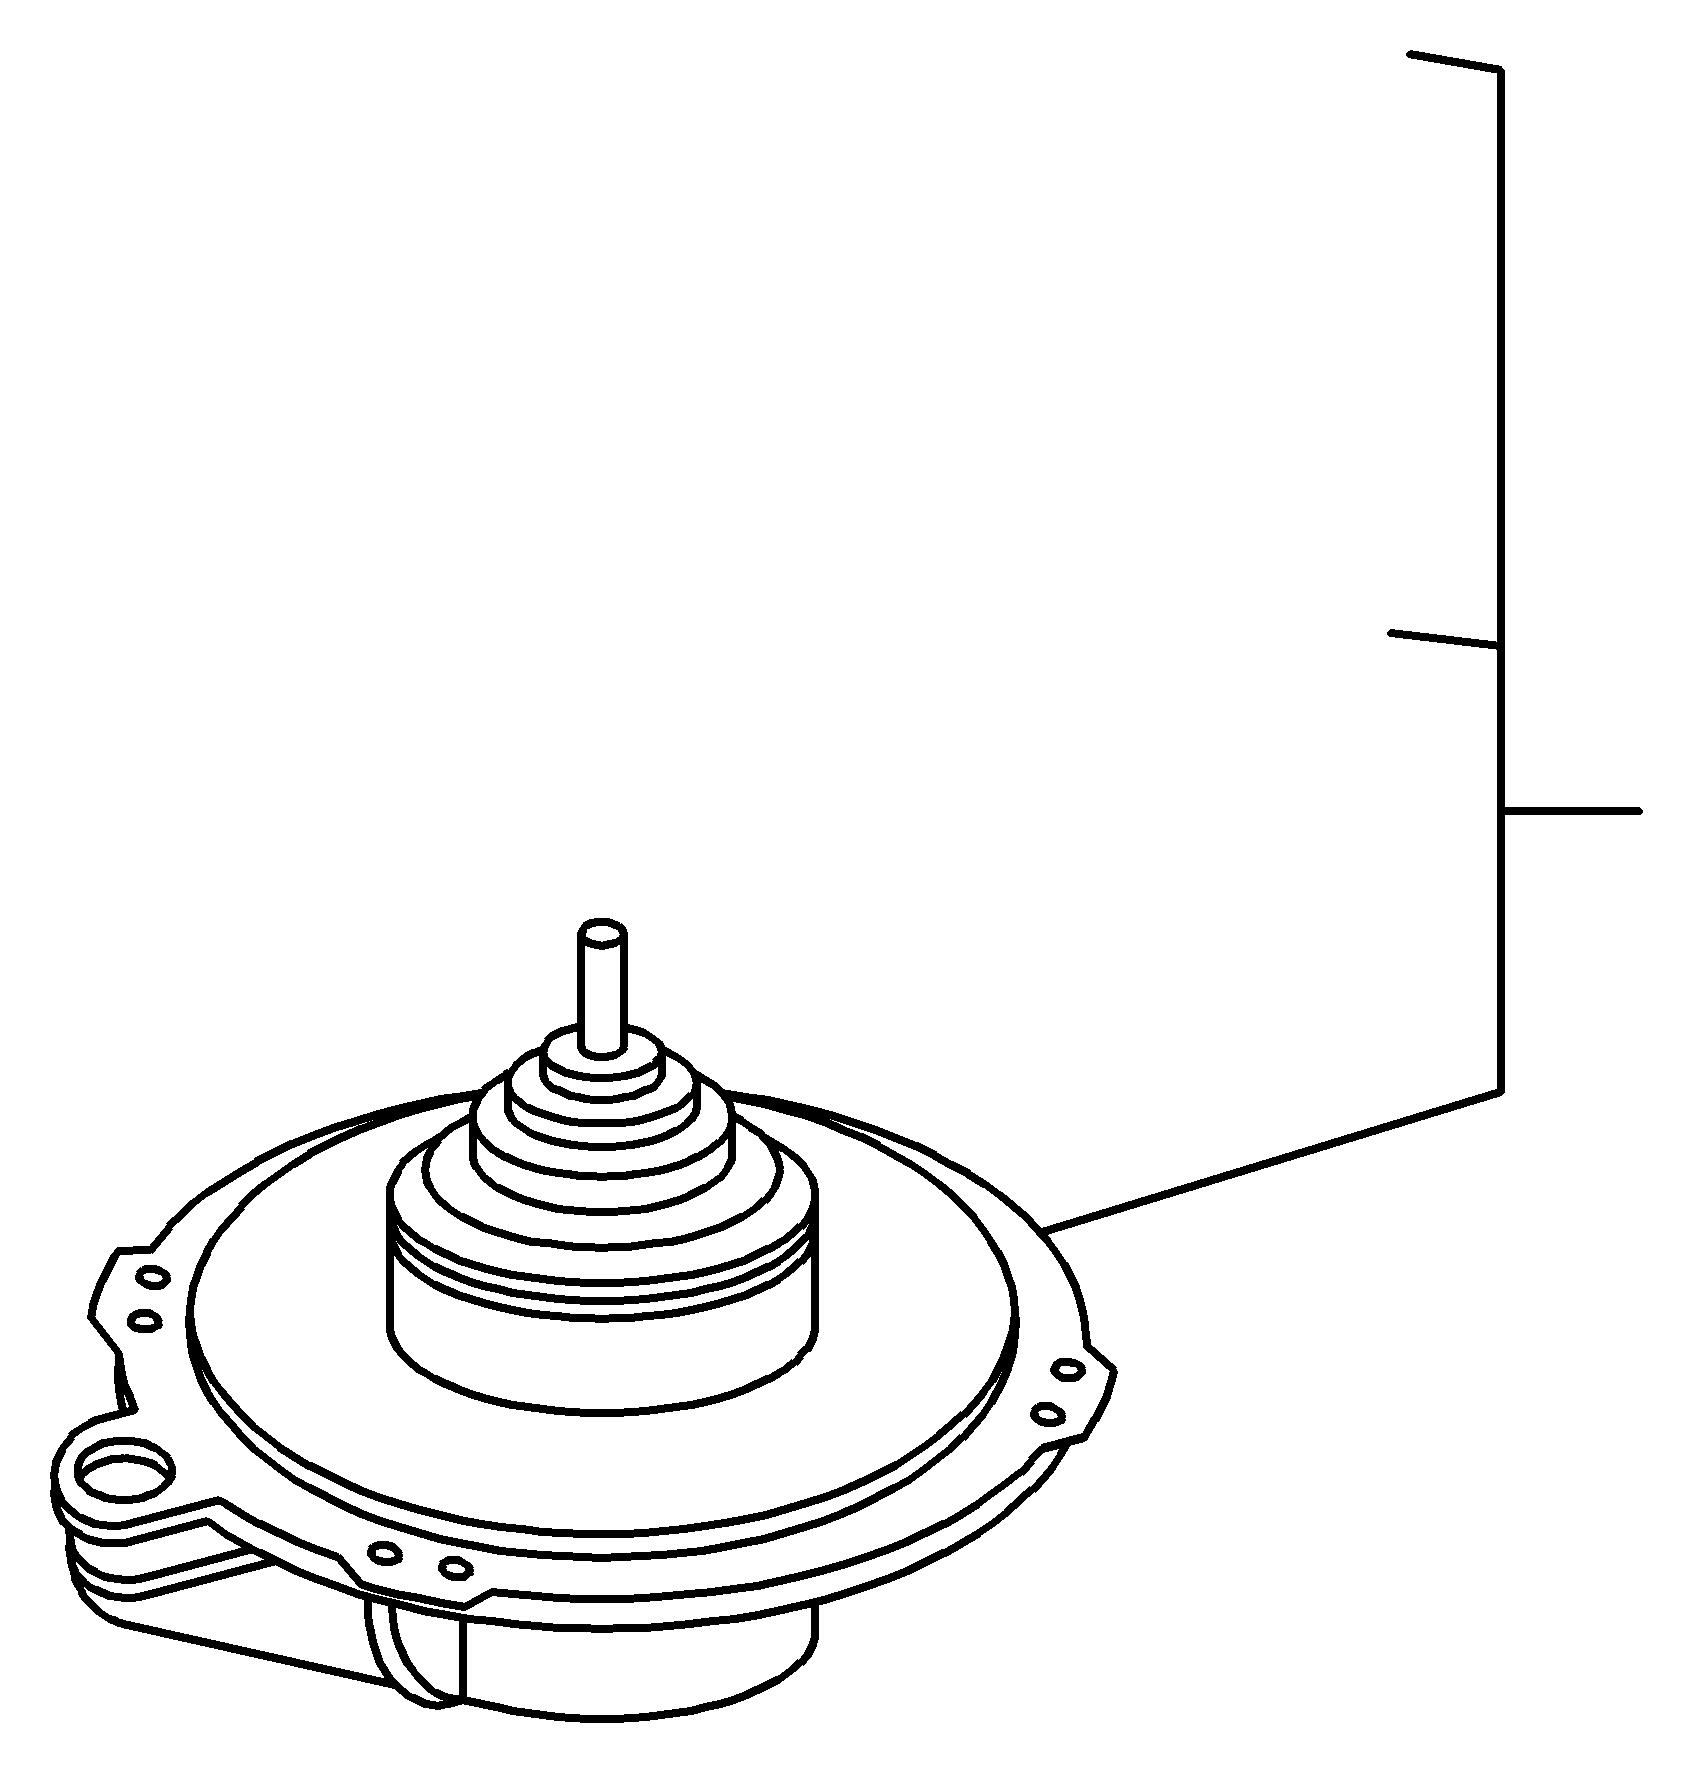 Isuzu Rodeo Wiring Diagram